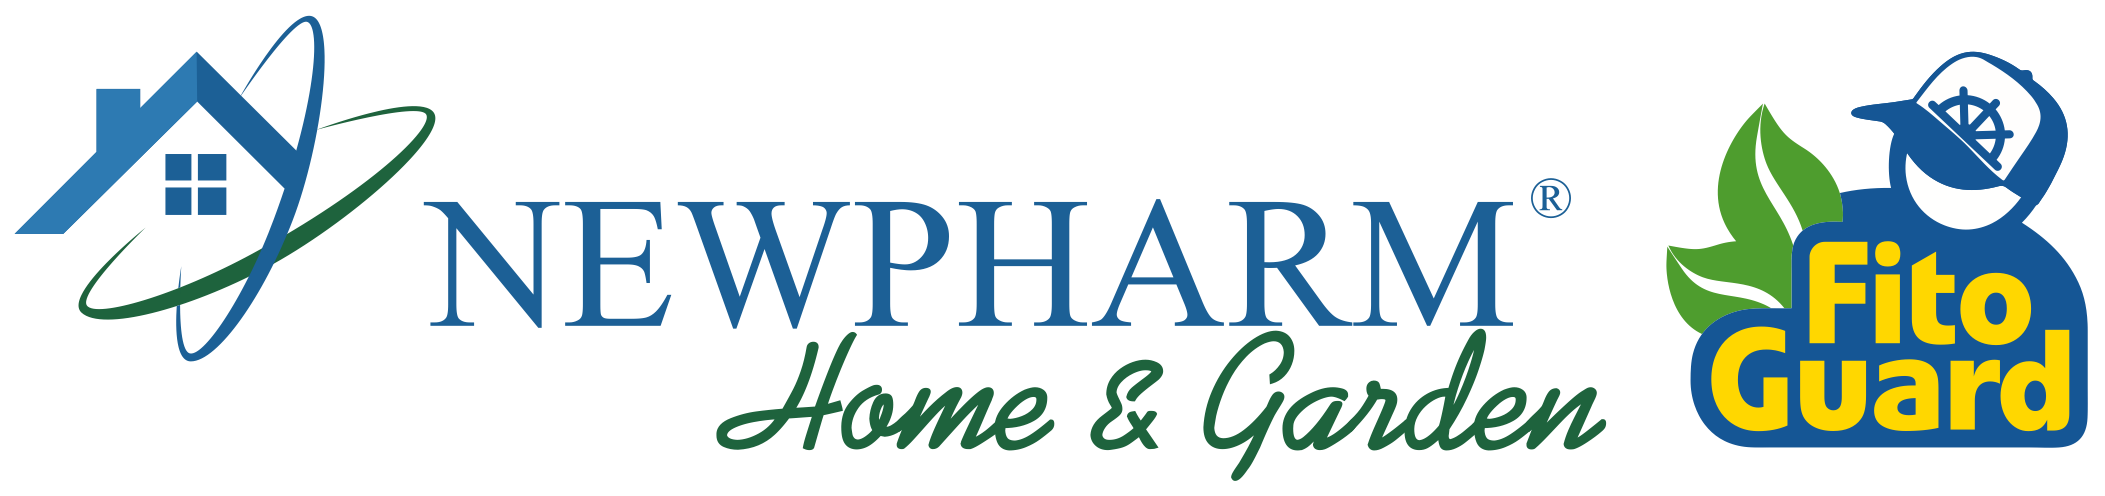 logo Newpharm